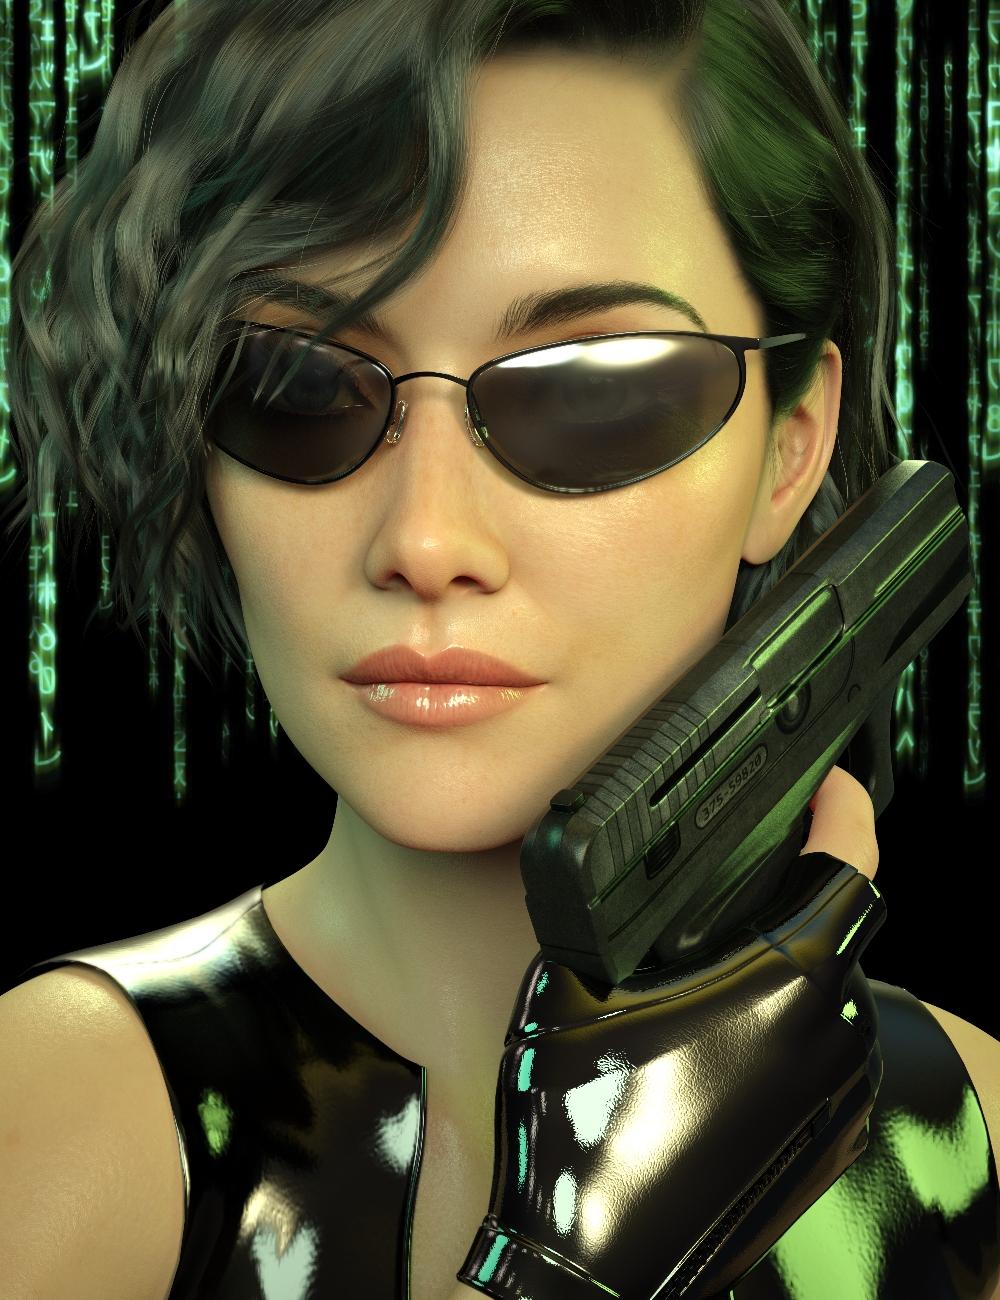 HS Storm for Genesis 8.1 Female by: Handspan Studios, 3D Models by Daz 3D